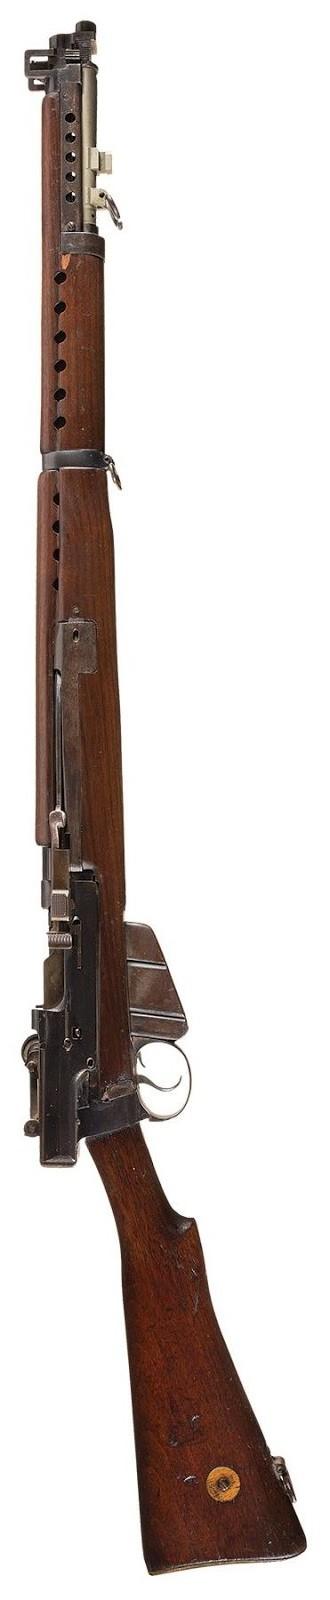 Turner arma Battlefield V